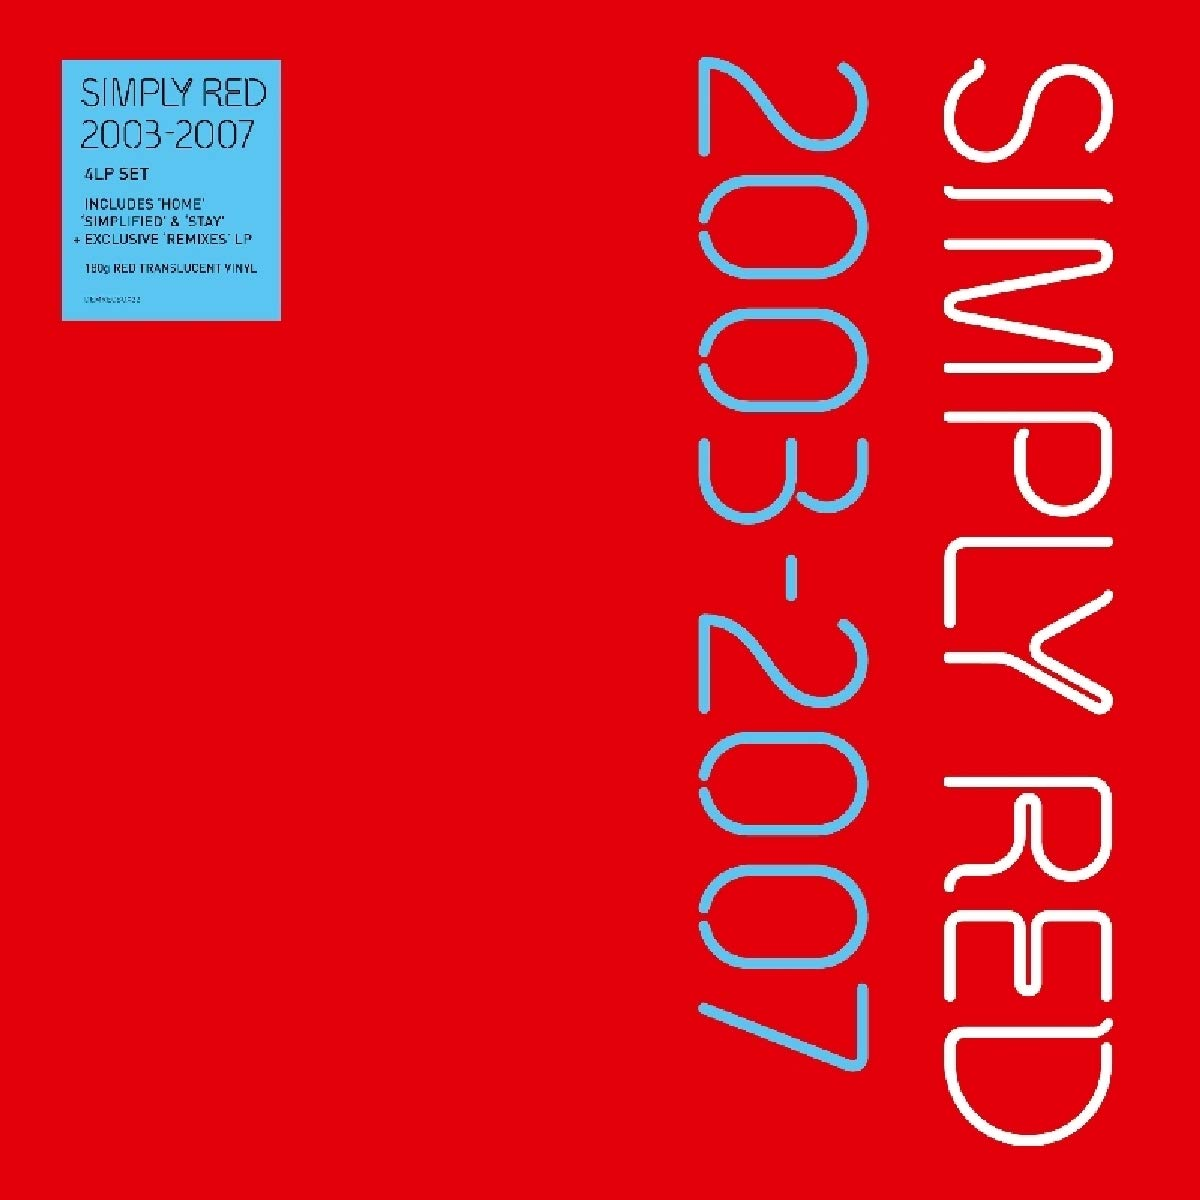 Vinilo : Simply Red - 2003-2007 (Boxed Set, United Kingdom - Import, Oversize Item Split)